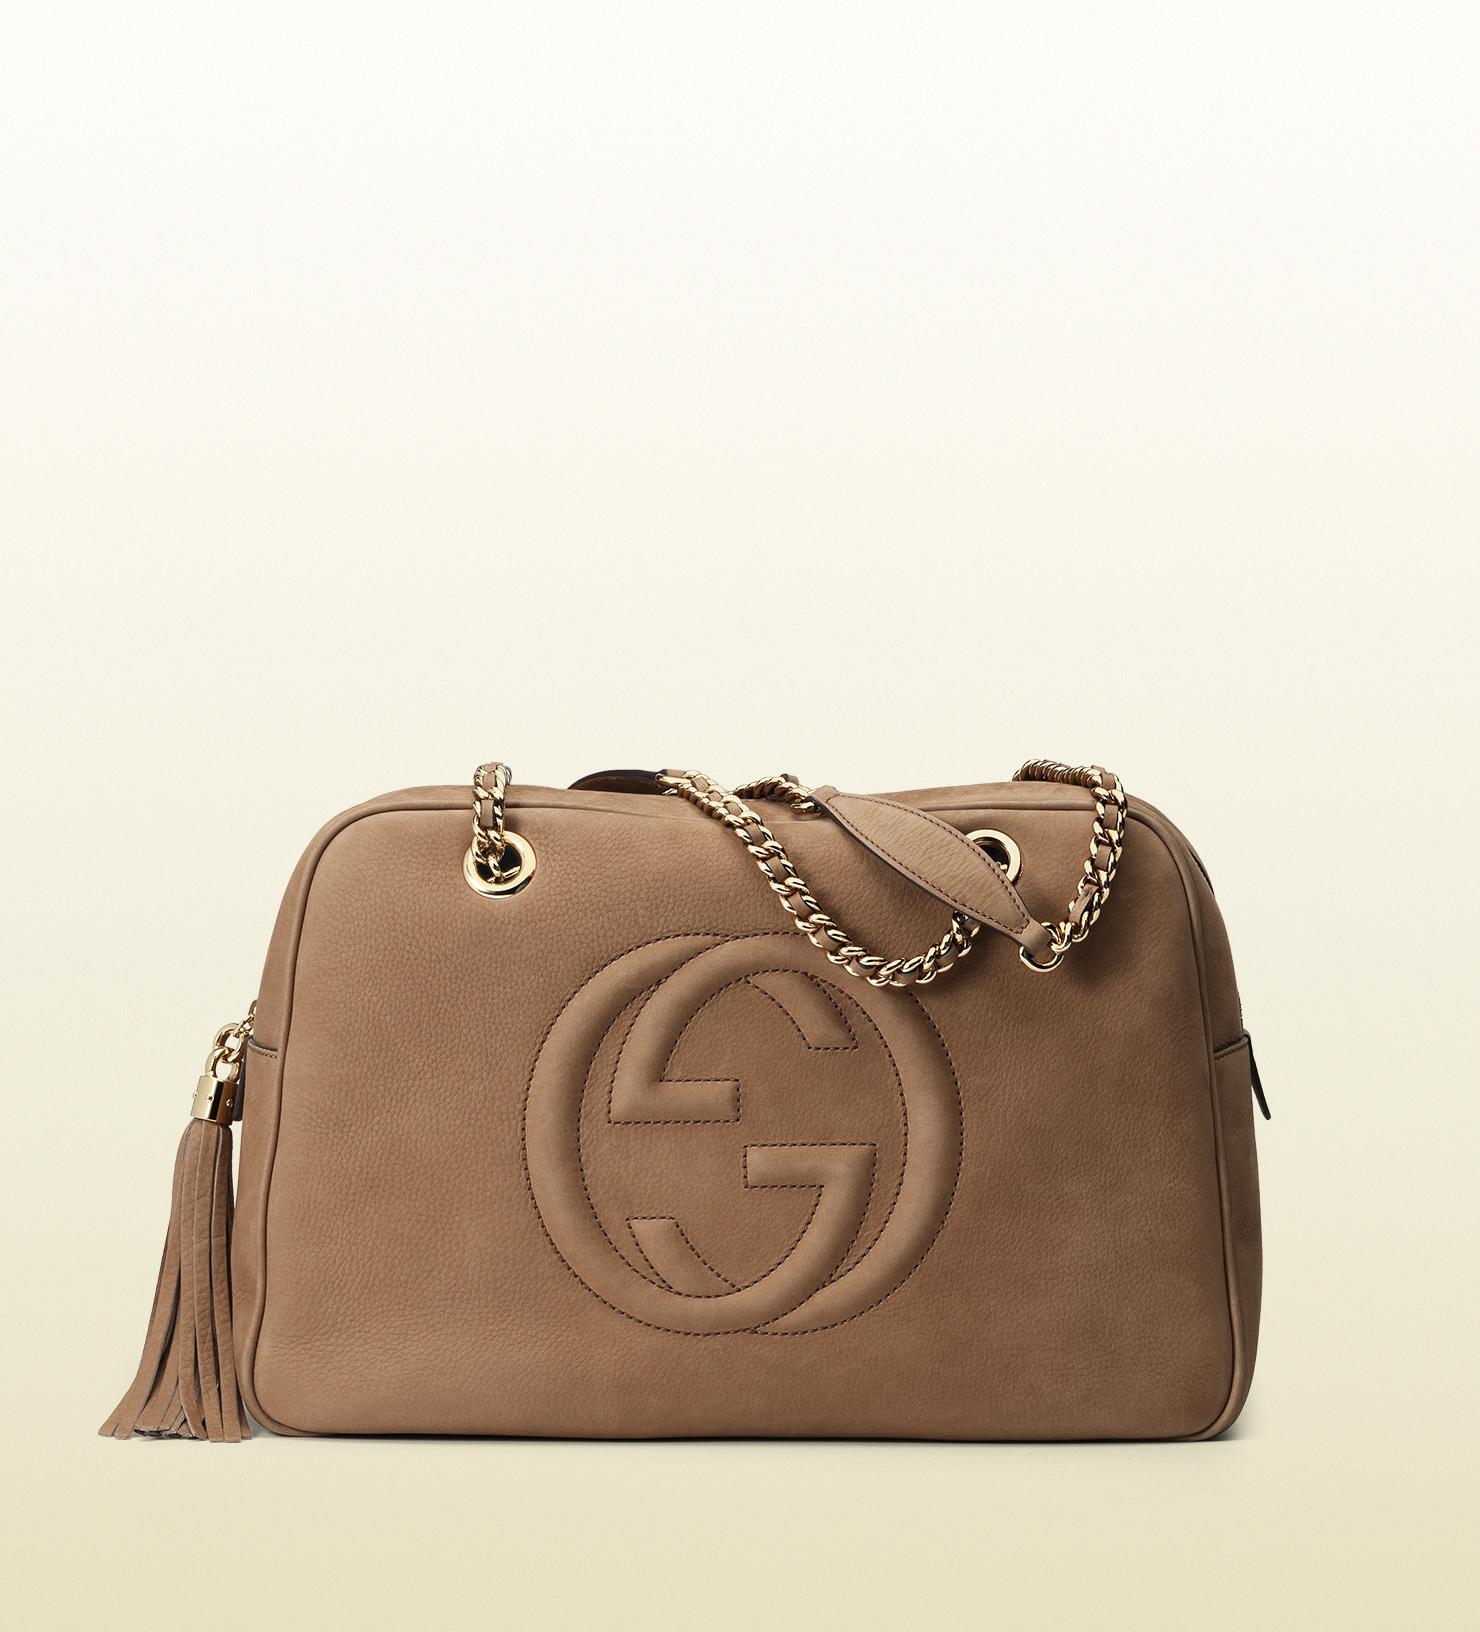 ea6fad0c57e Gucci Soho Nubuck Leather Chain Shoulder Bag in Brown - Lyst